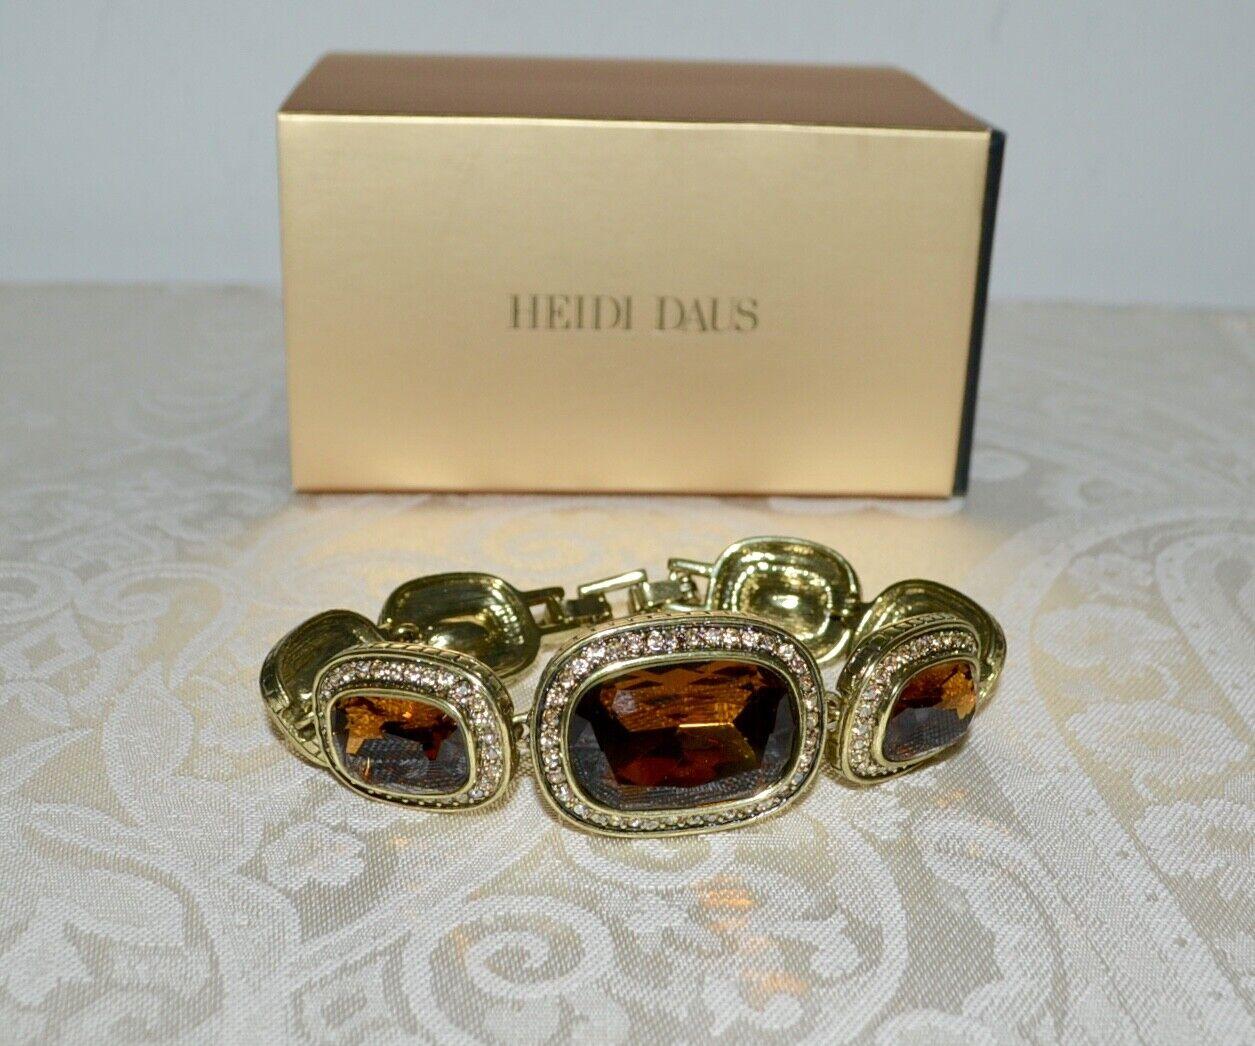 New  190 HEIDI DAUS Exquisite Elegance Crystal Bracelet Topaz